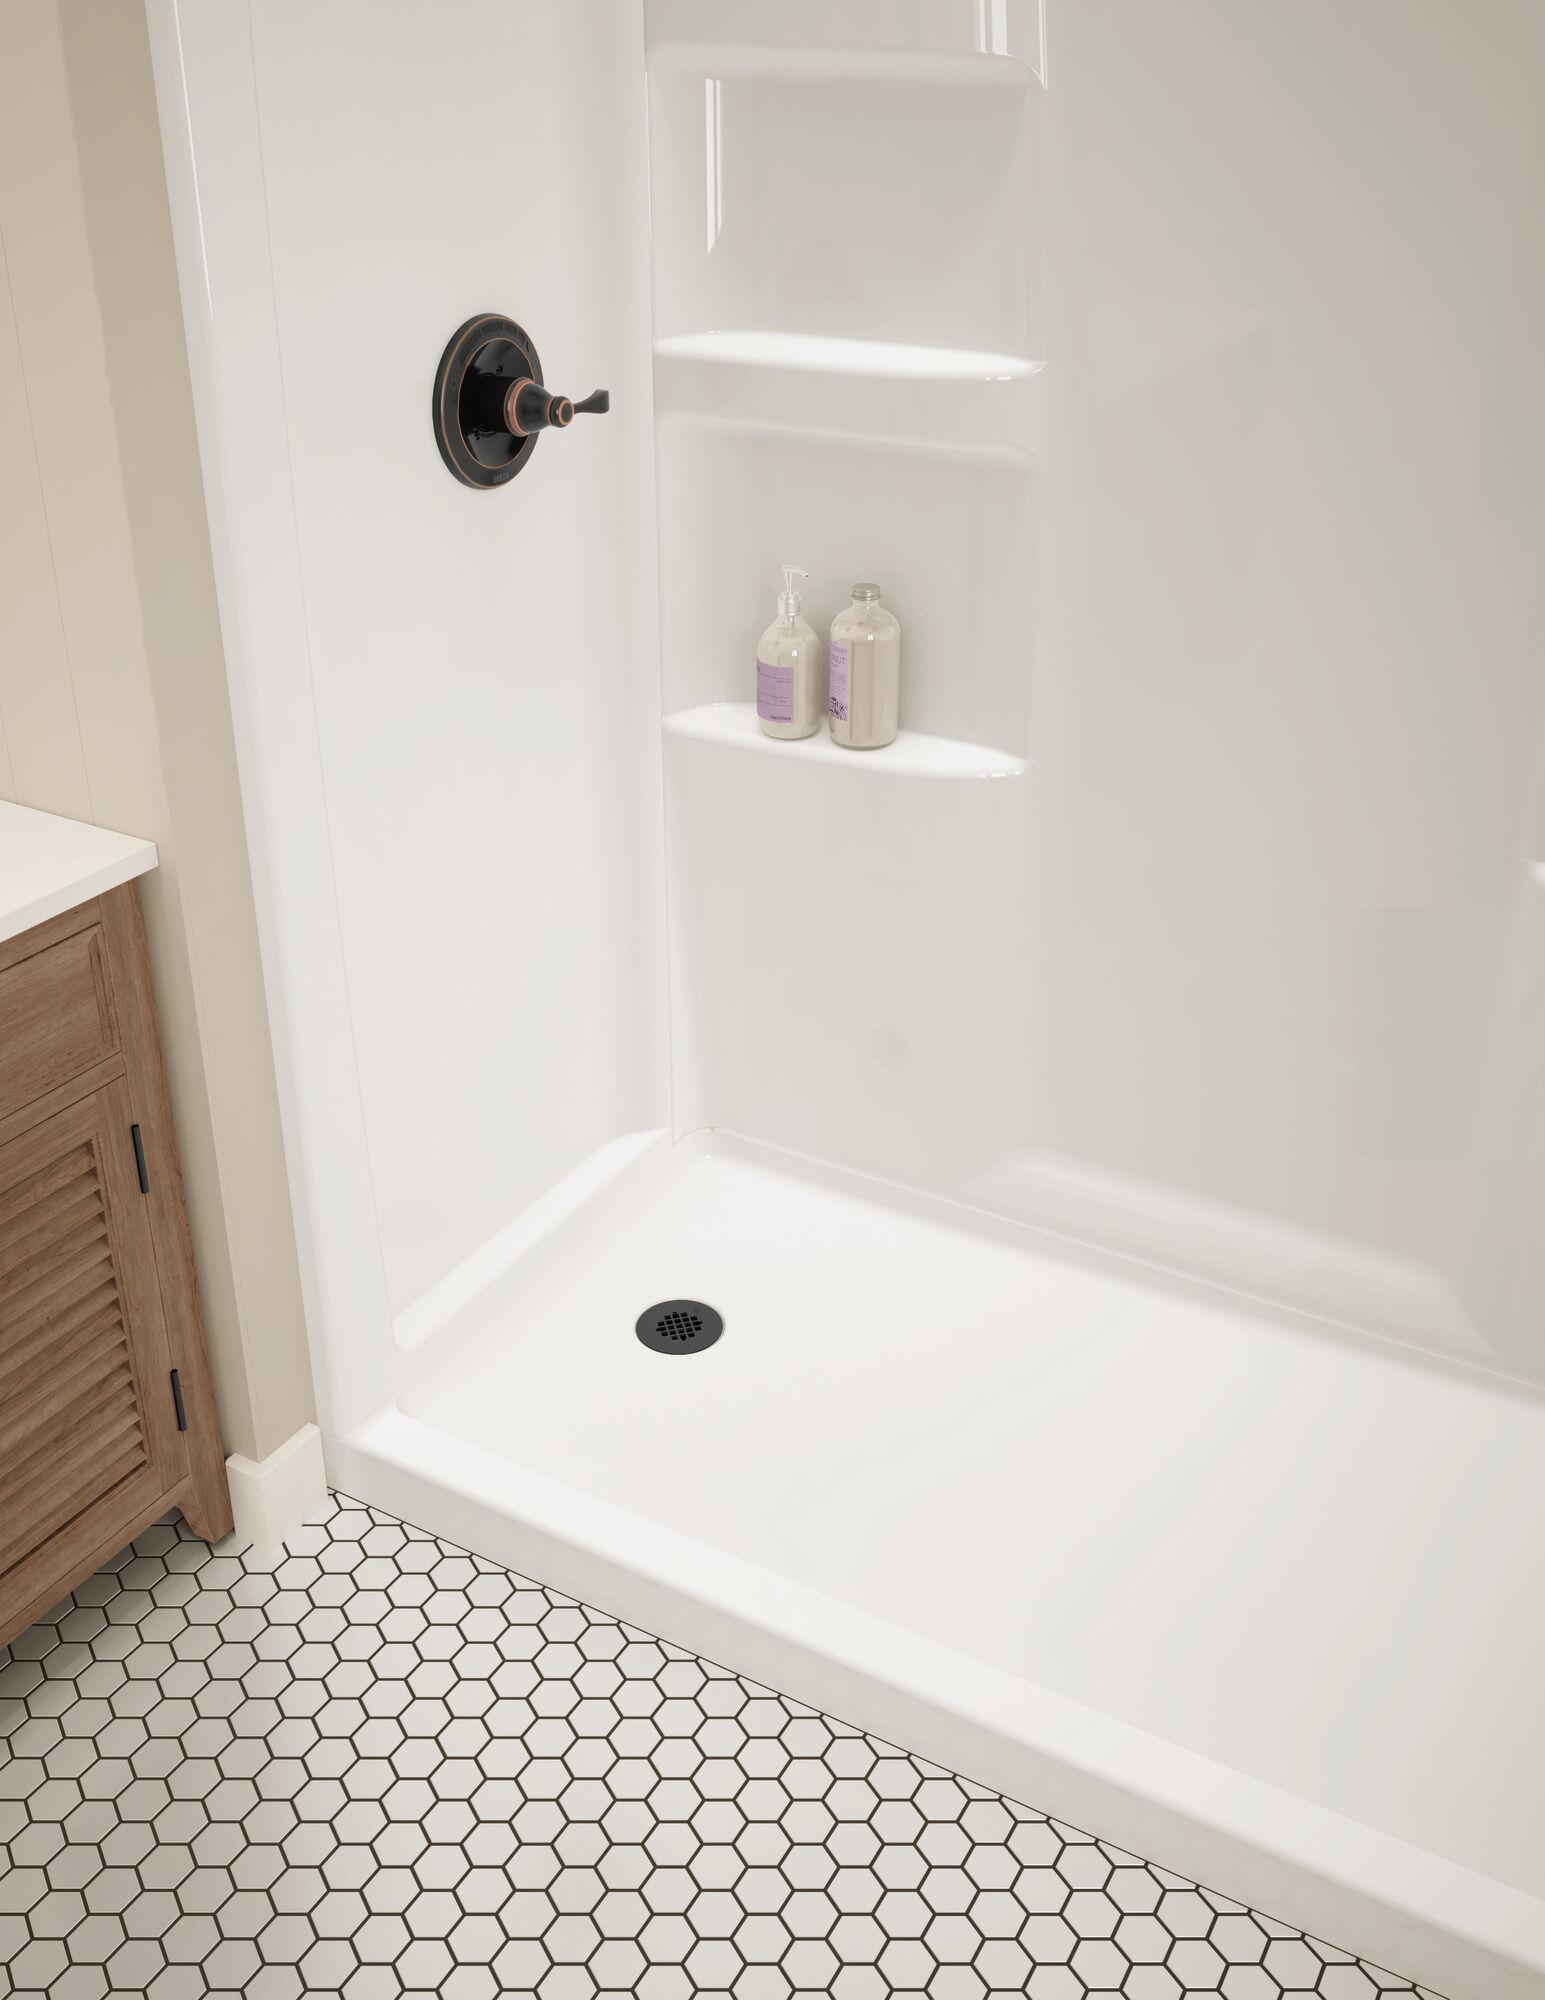 procrylic 60 in x 30 in shower surround